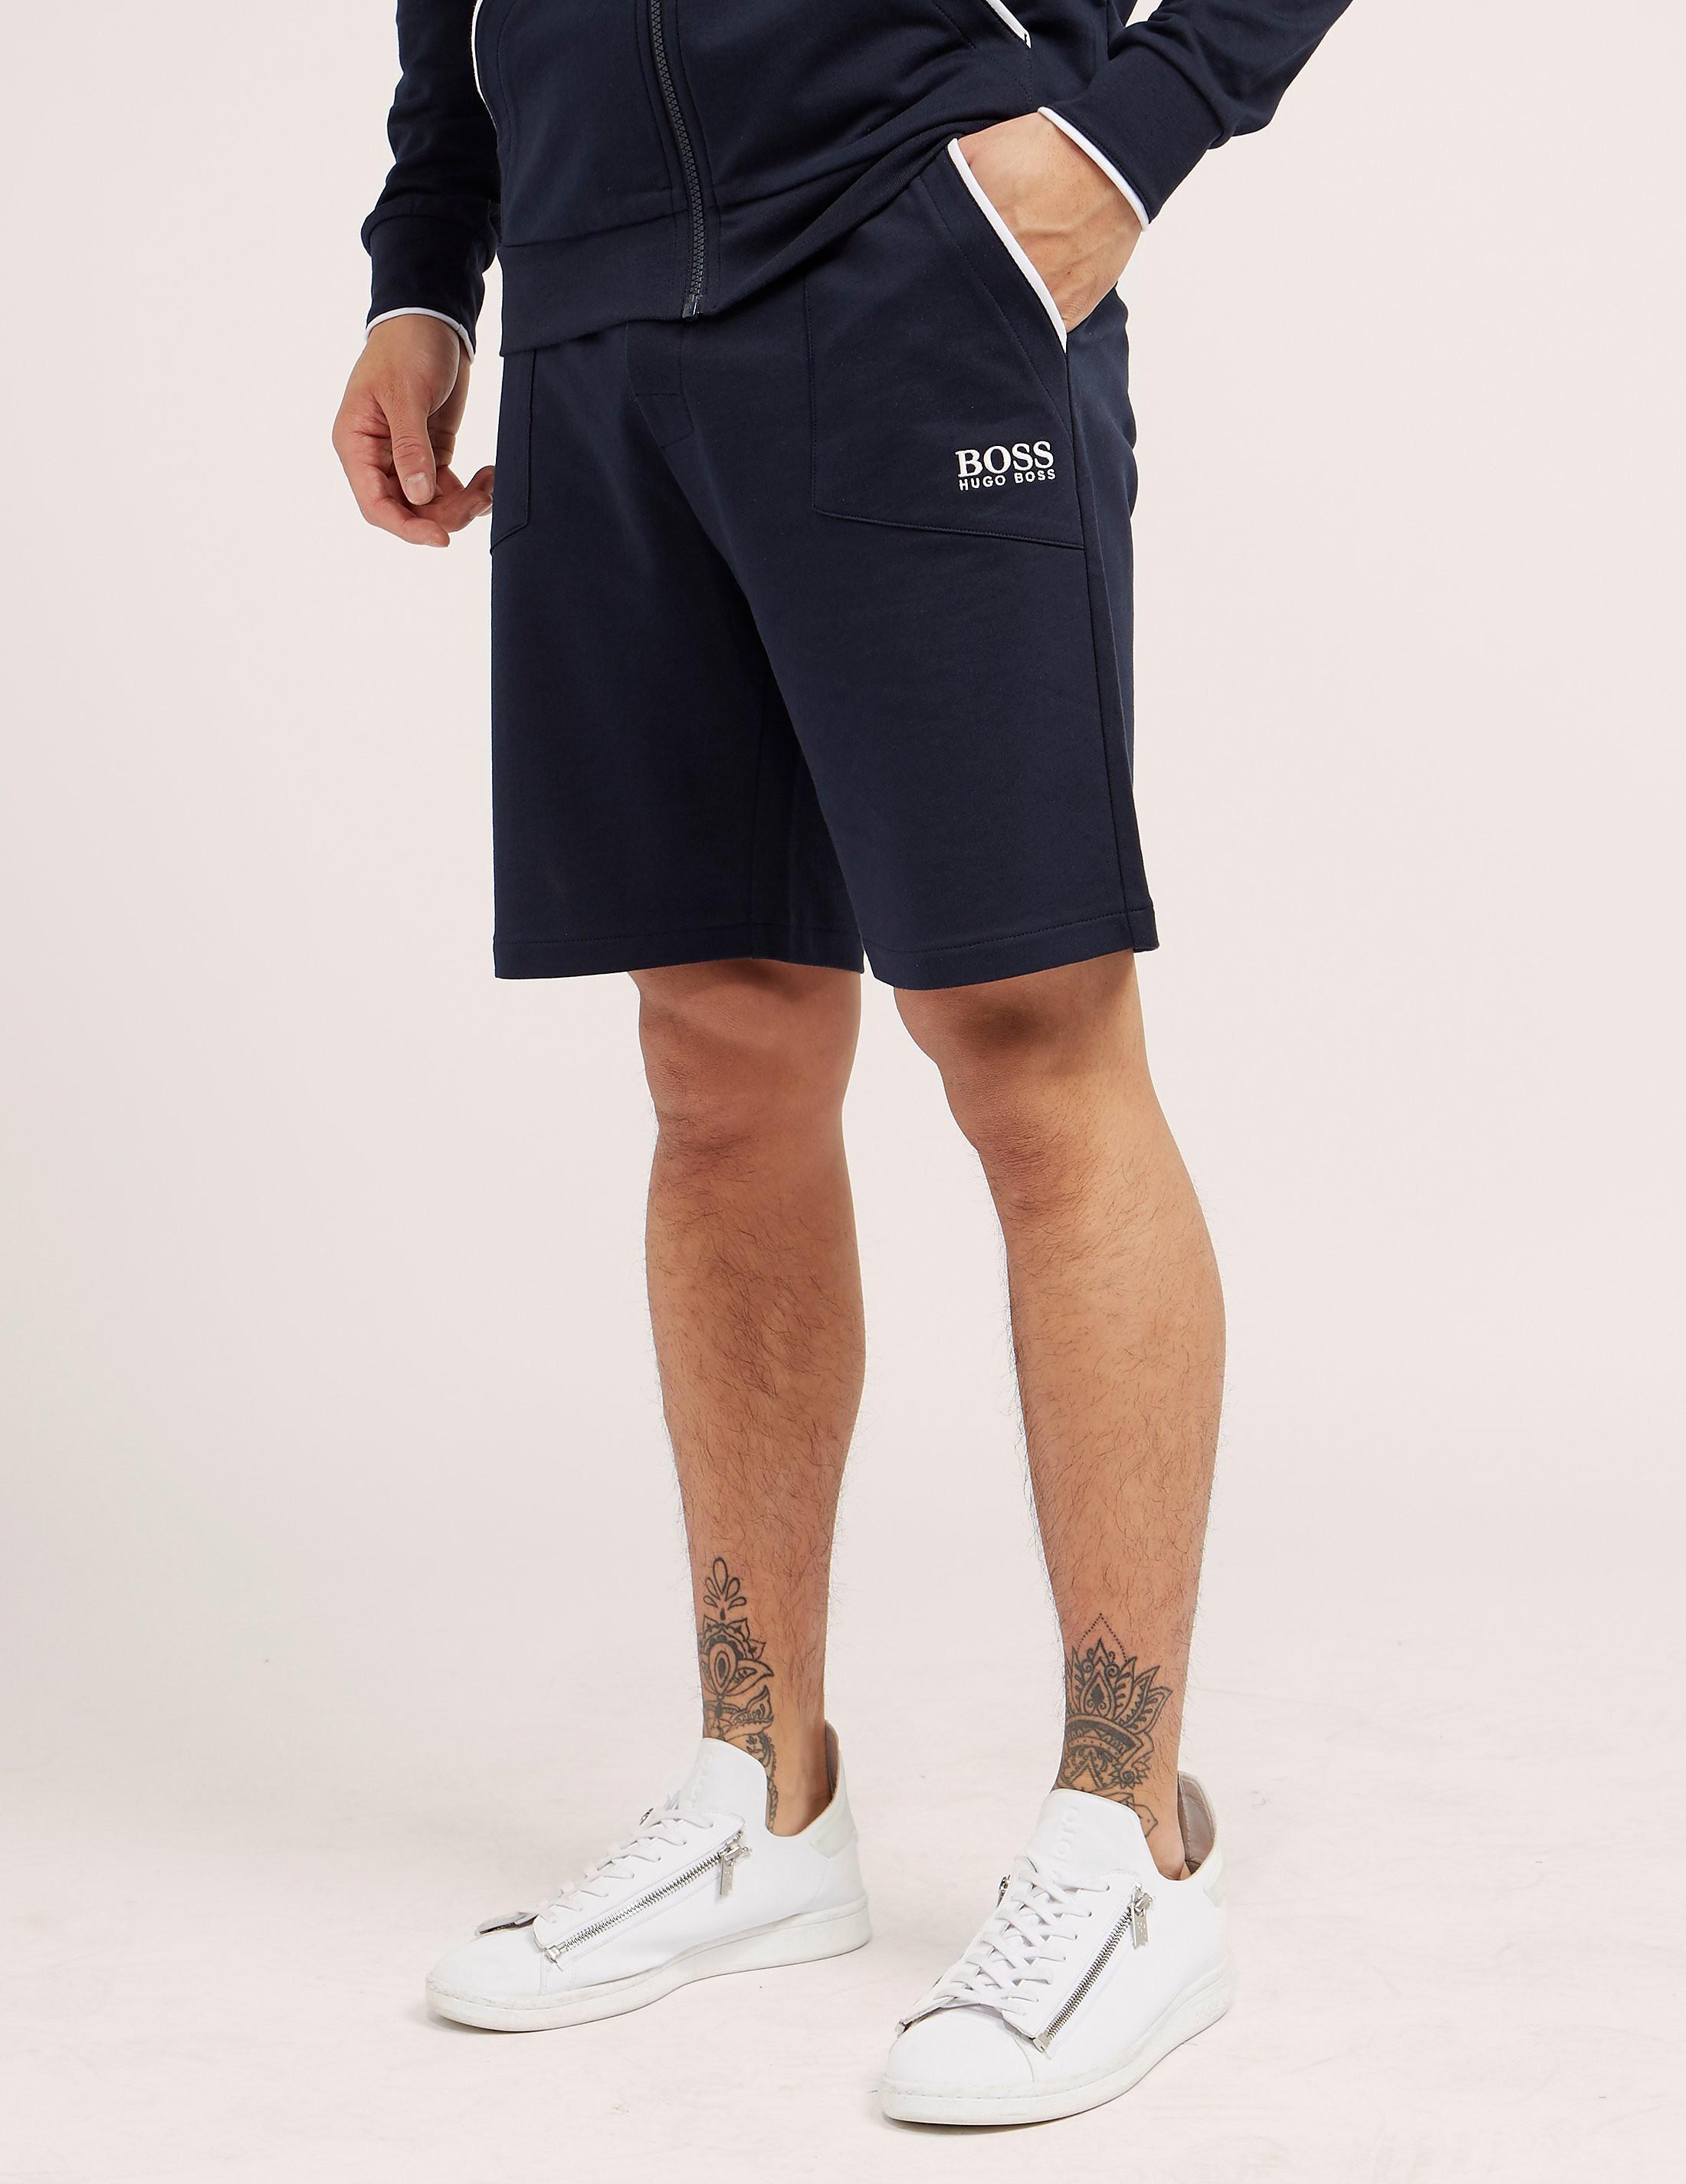 BOSS FT Shorts